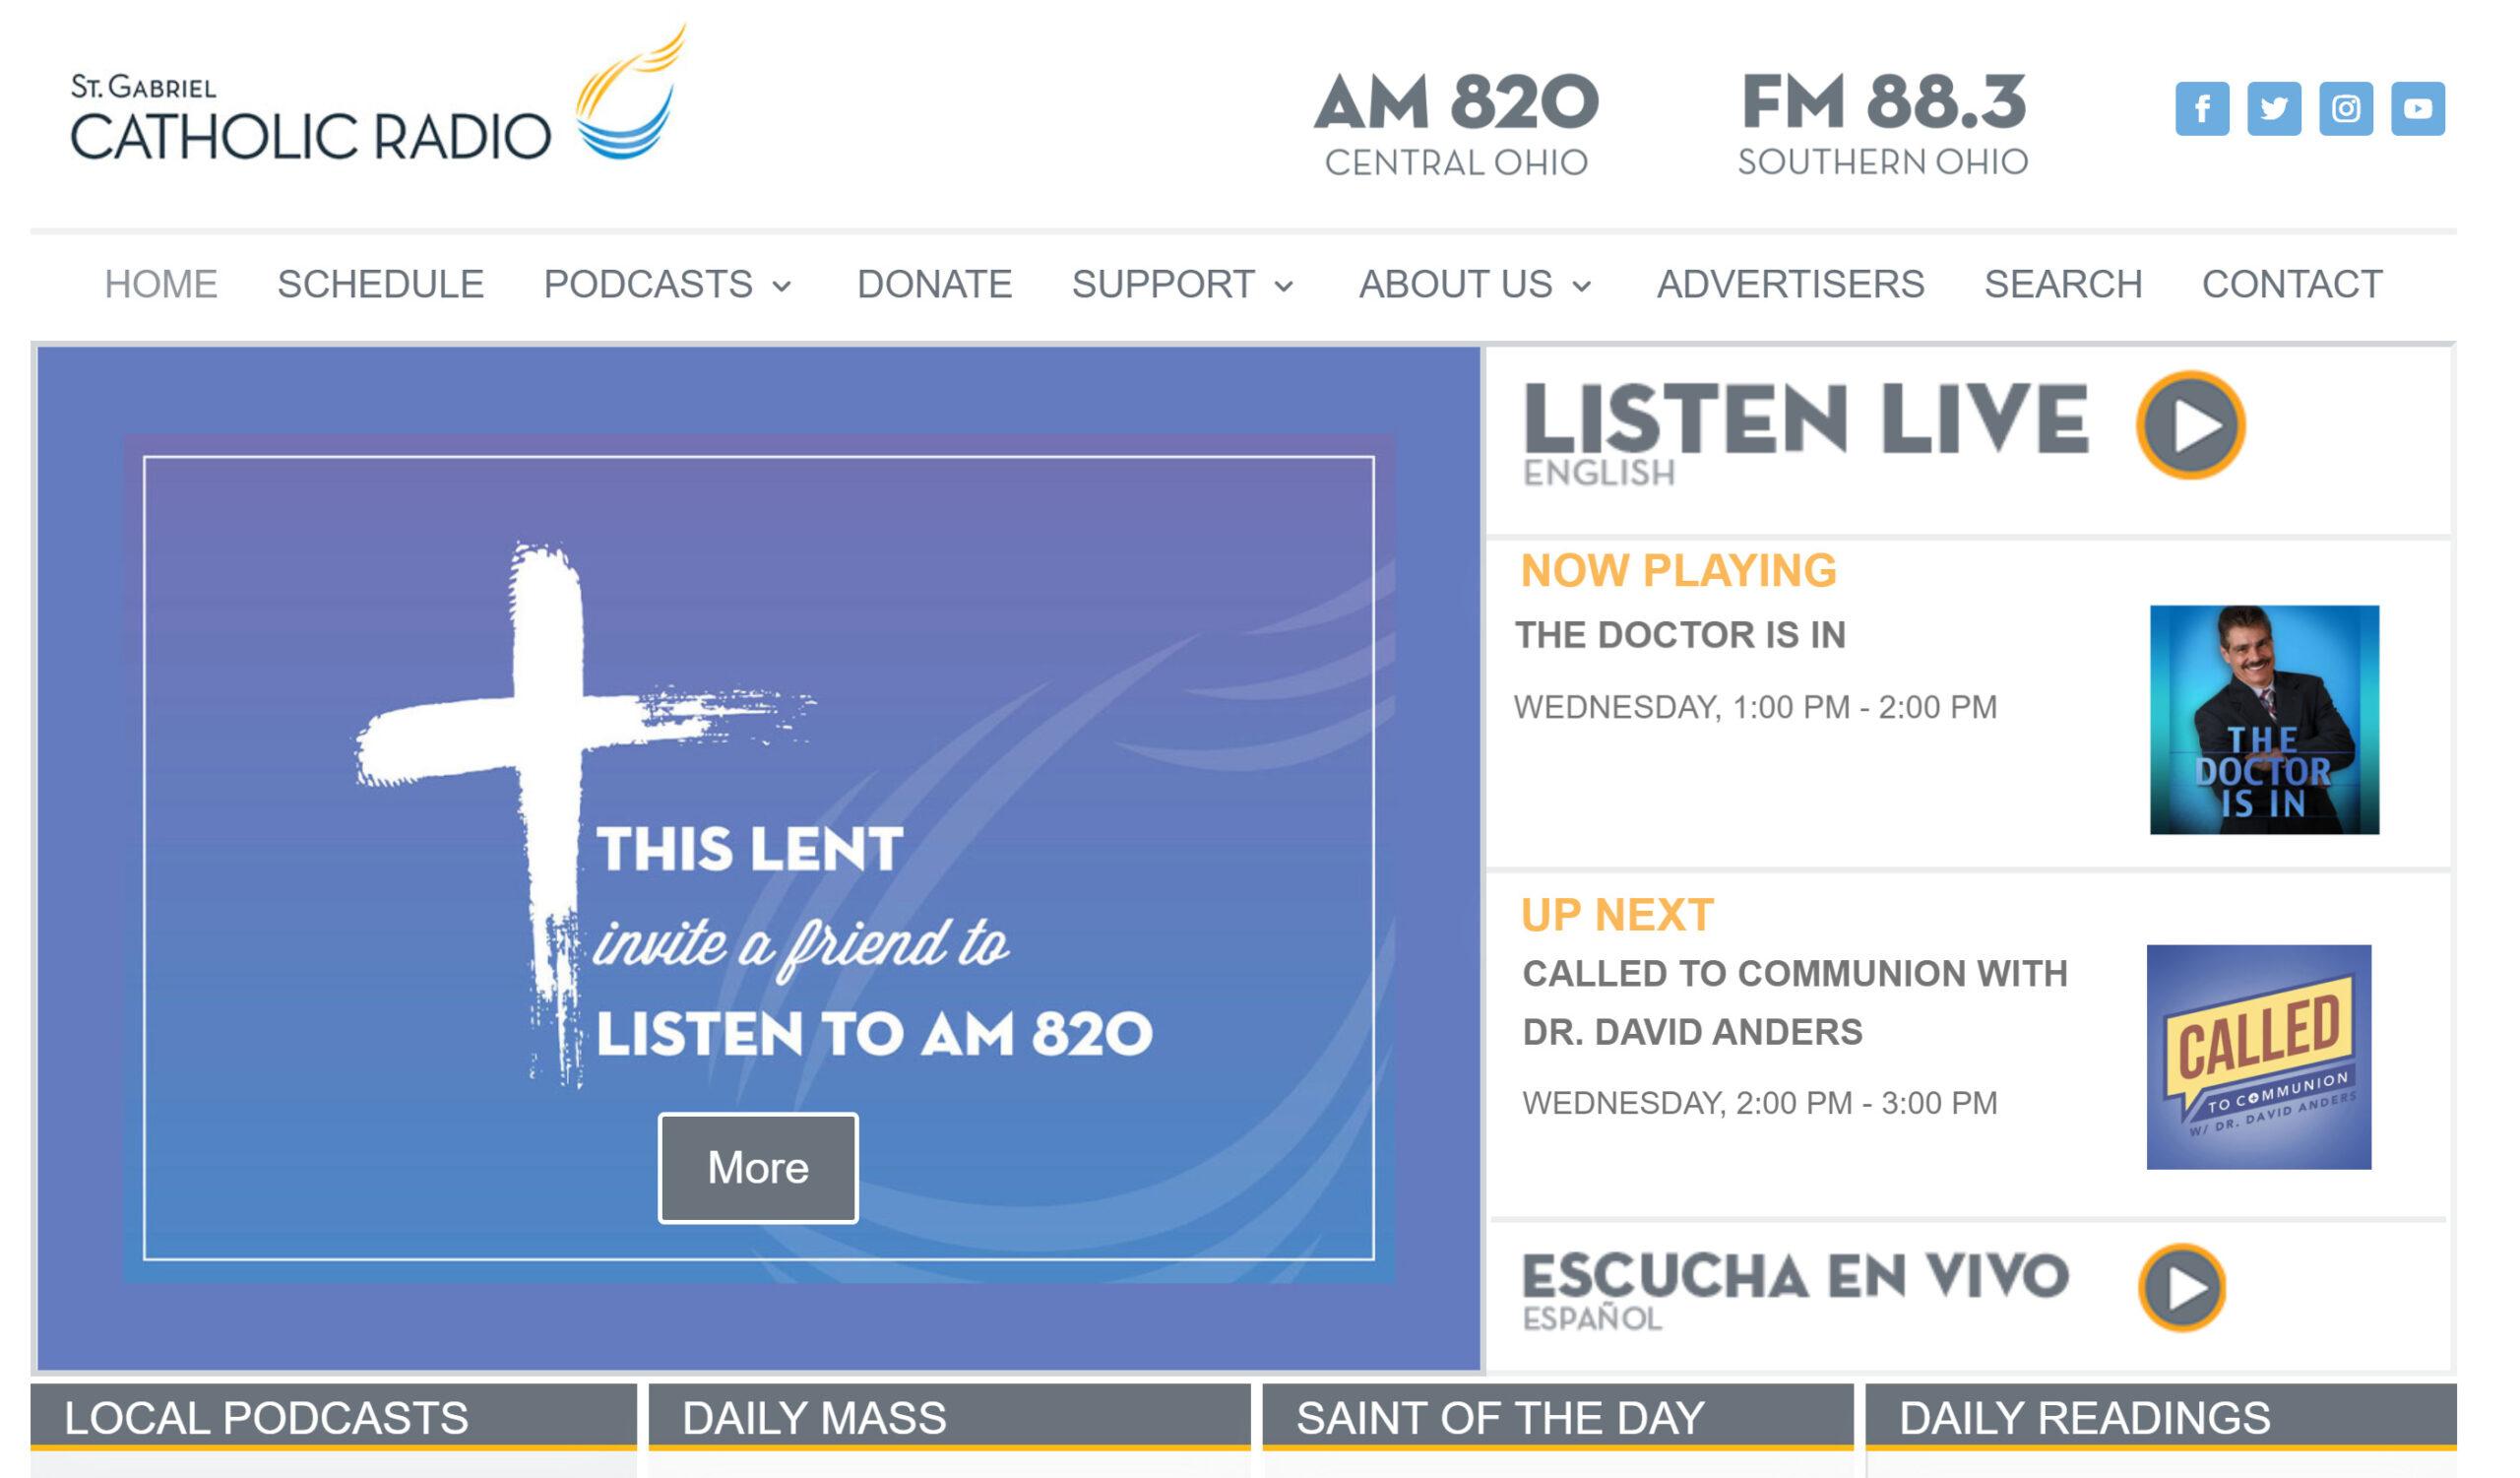 St Gabriel Catholic Radio